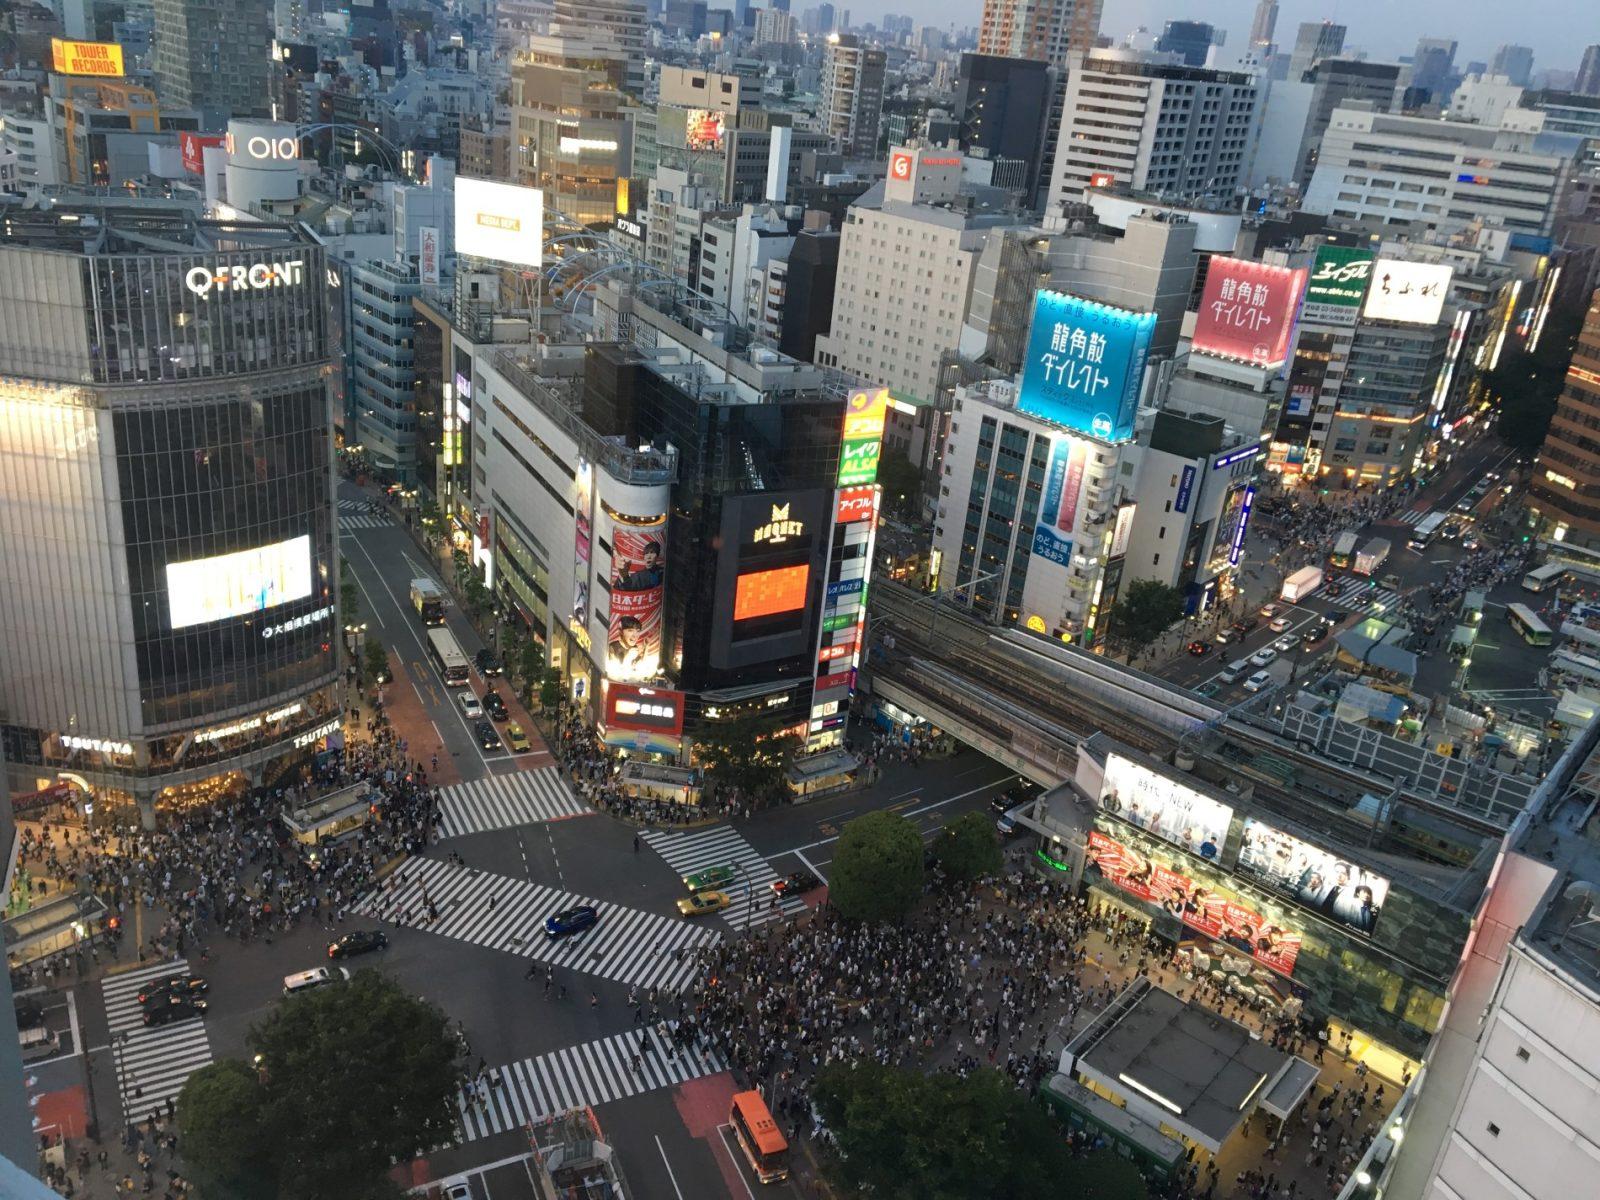 Impression of Tokyo – Shibuya Crossing